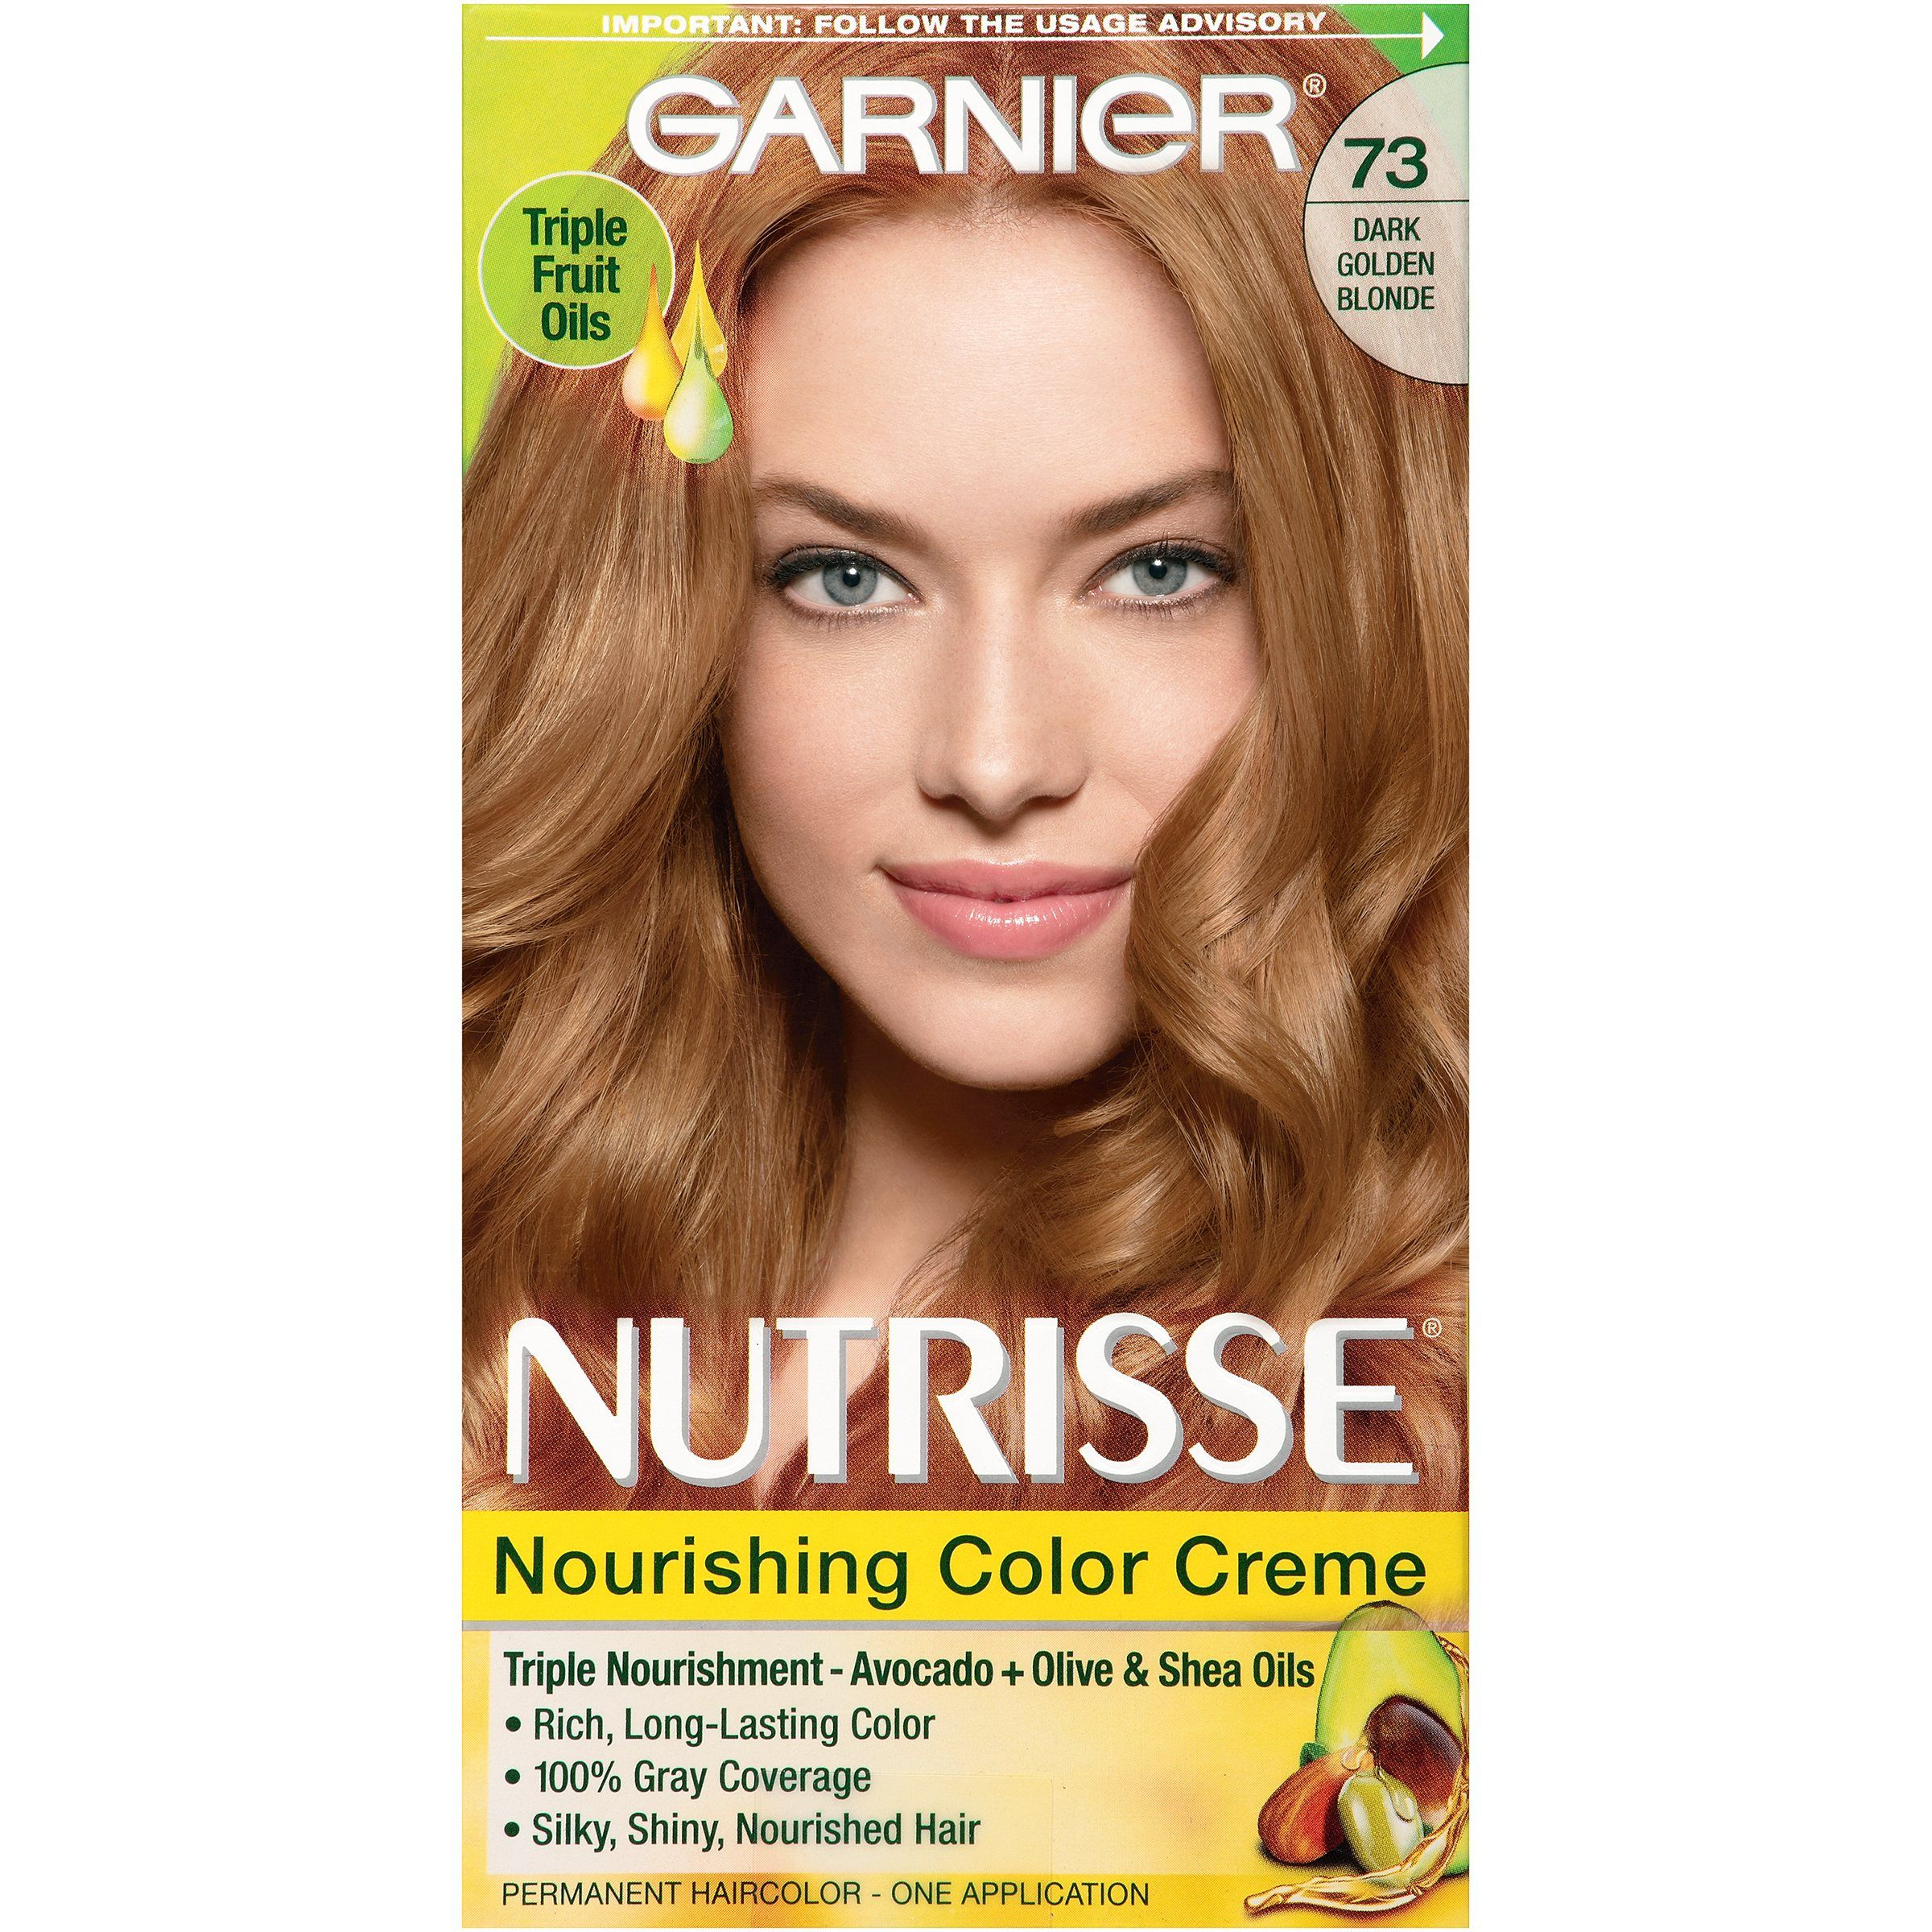 Garnier Nutrisse Nourishing Hair Color Creme Blondes 80 Medium